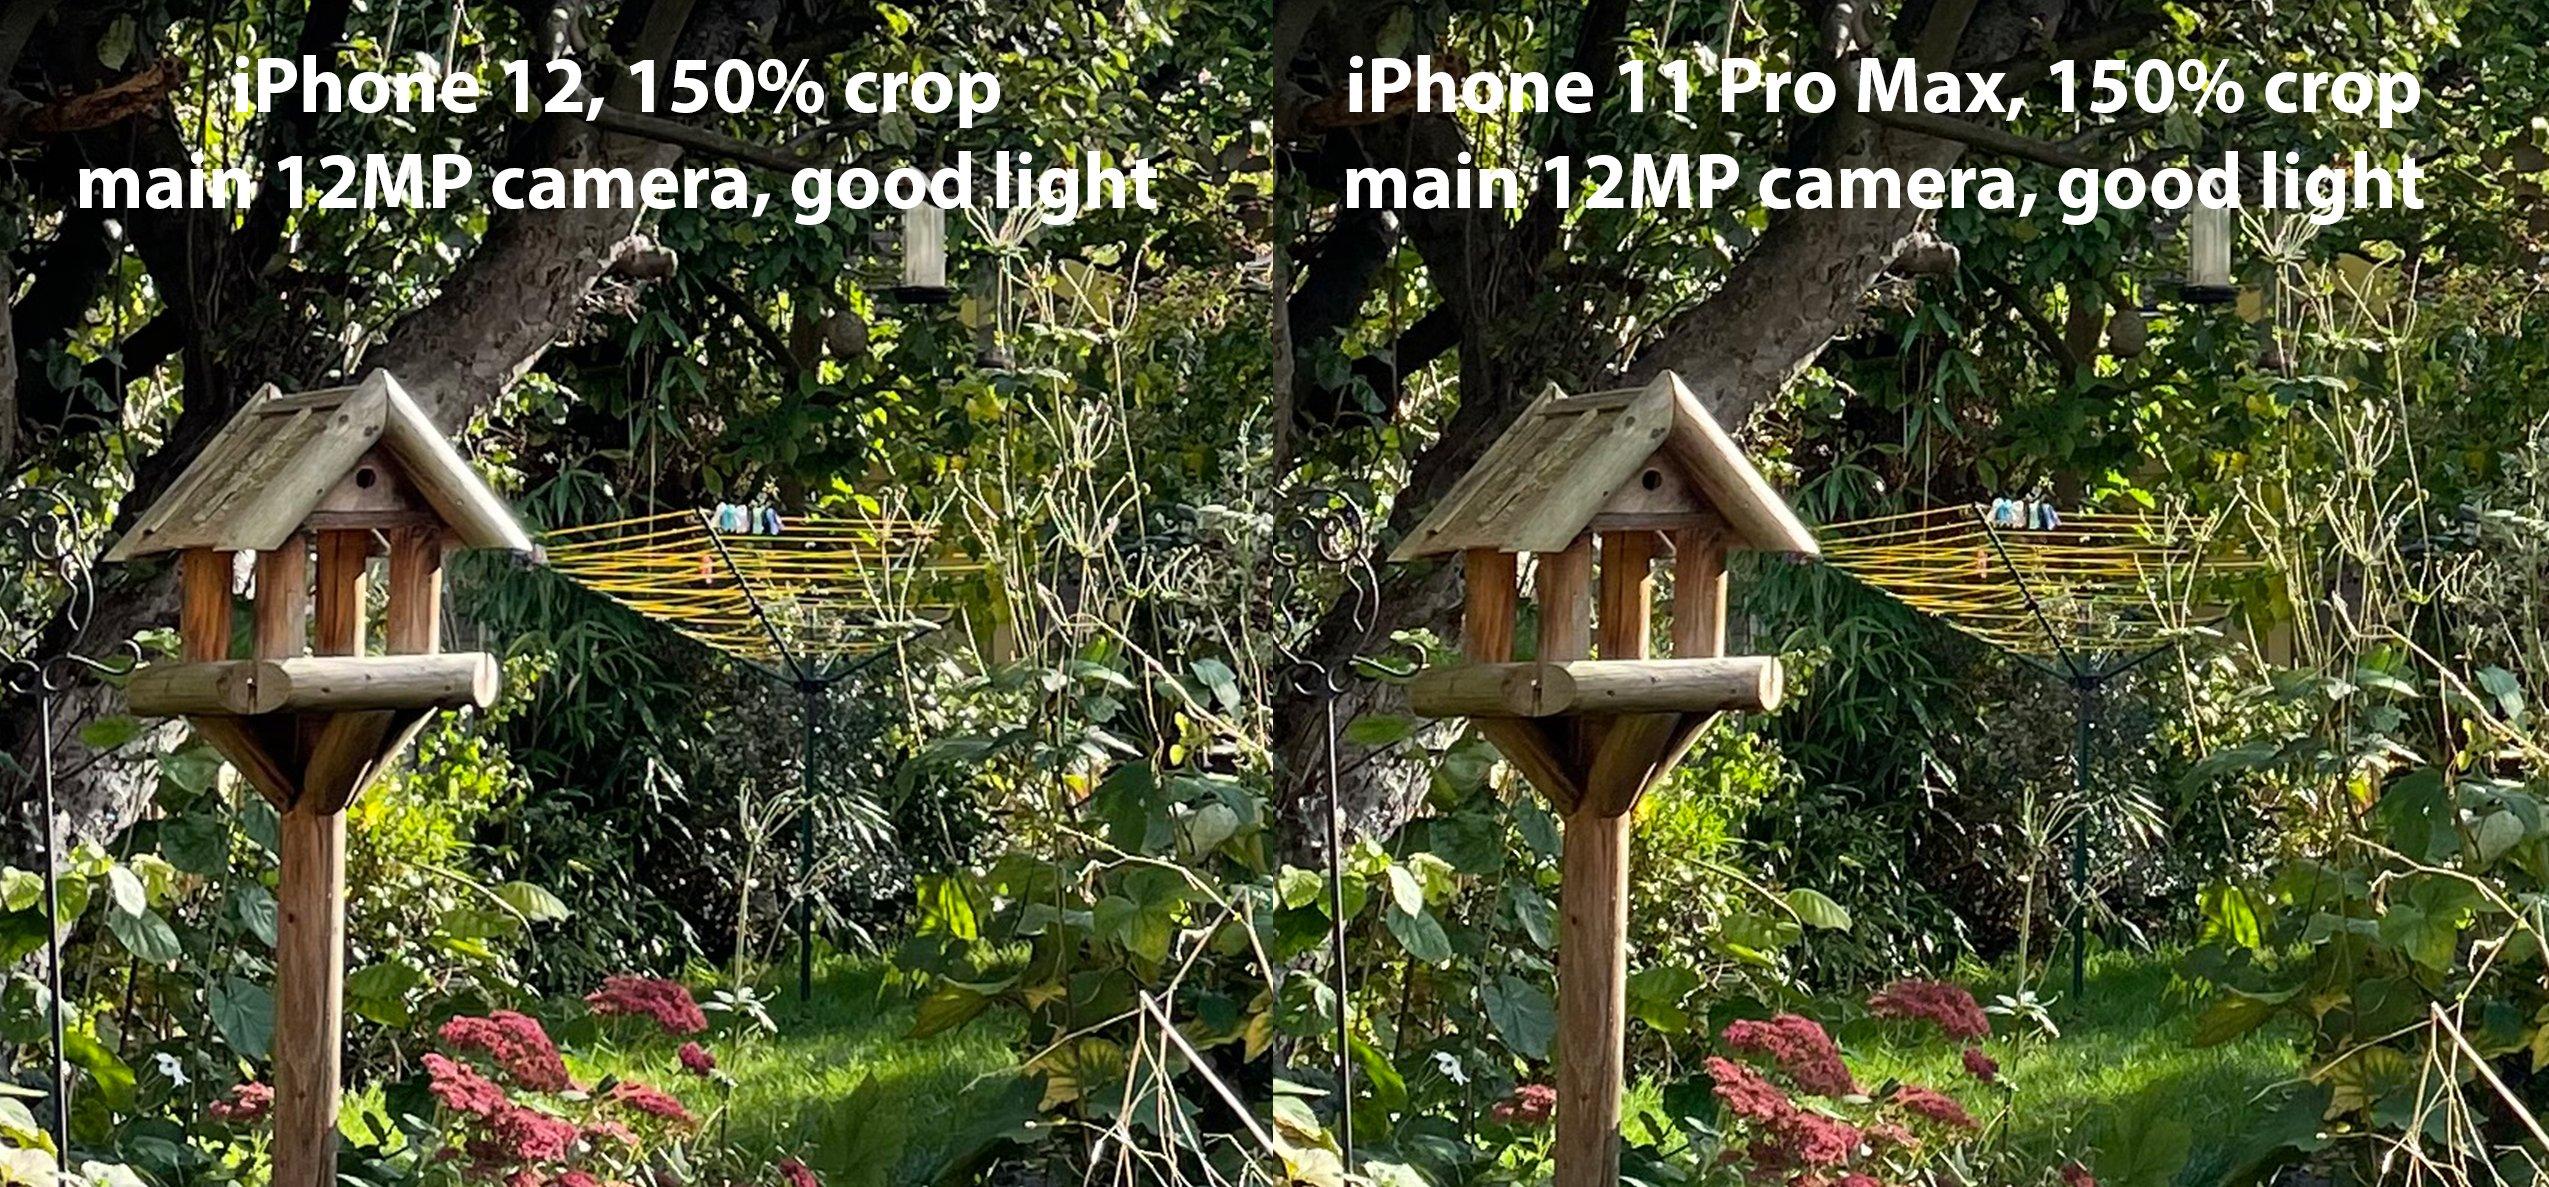 iphone_12_vs_iphone_11_pro_max_good_light_main_camera.jpg